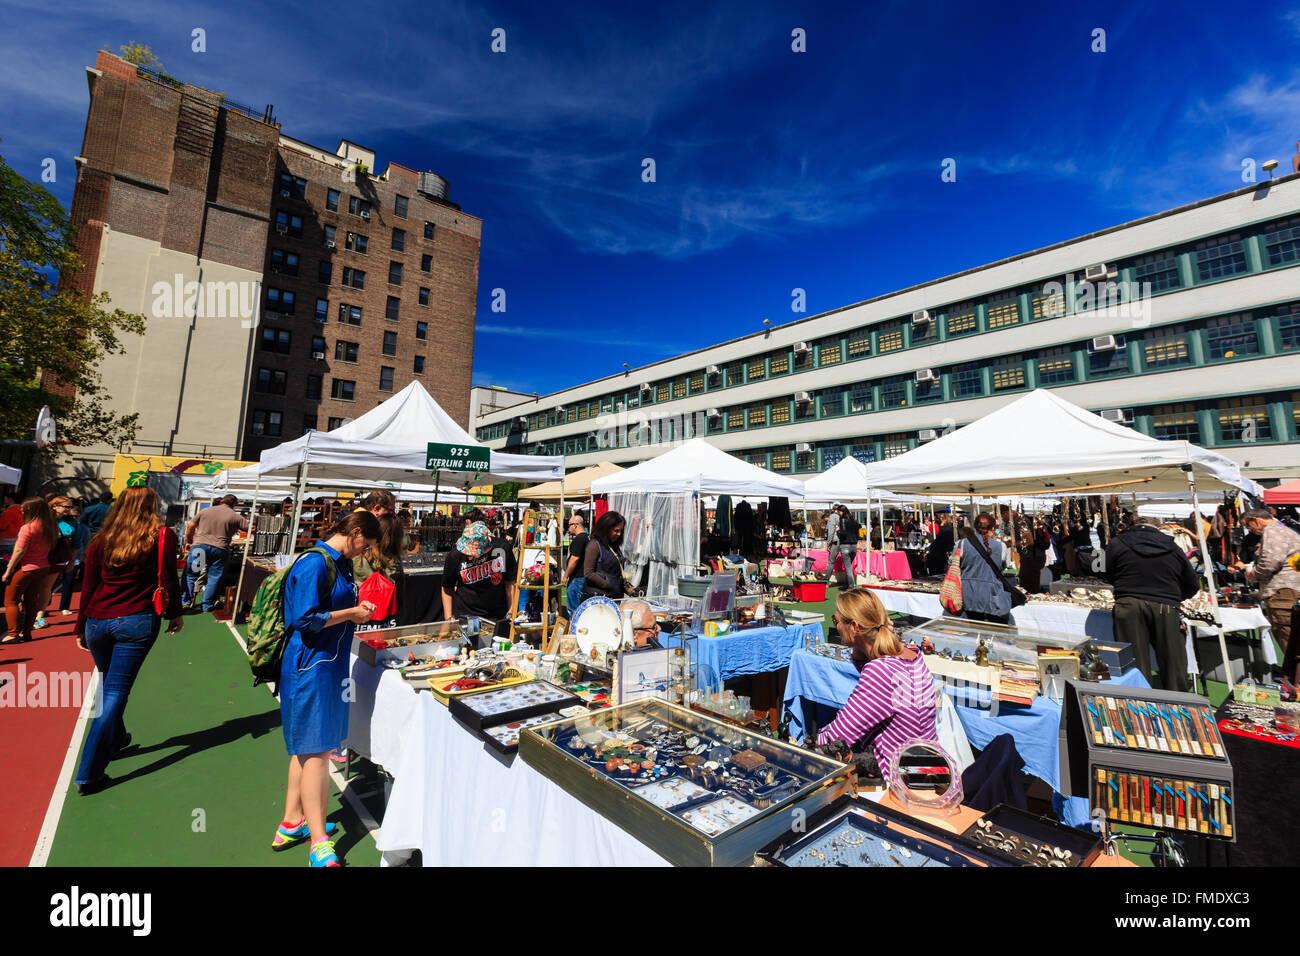 NEW YORK CITY, SEP 15: Flea market on SEP 15, 2014 at New York City. - Stock Image